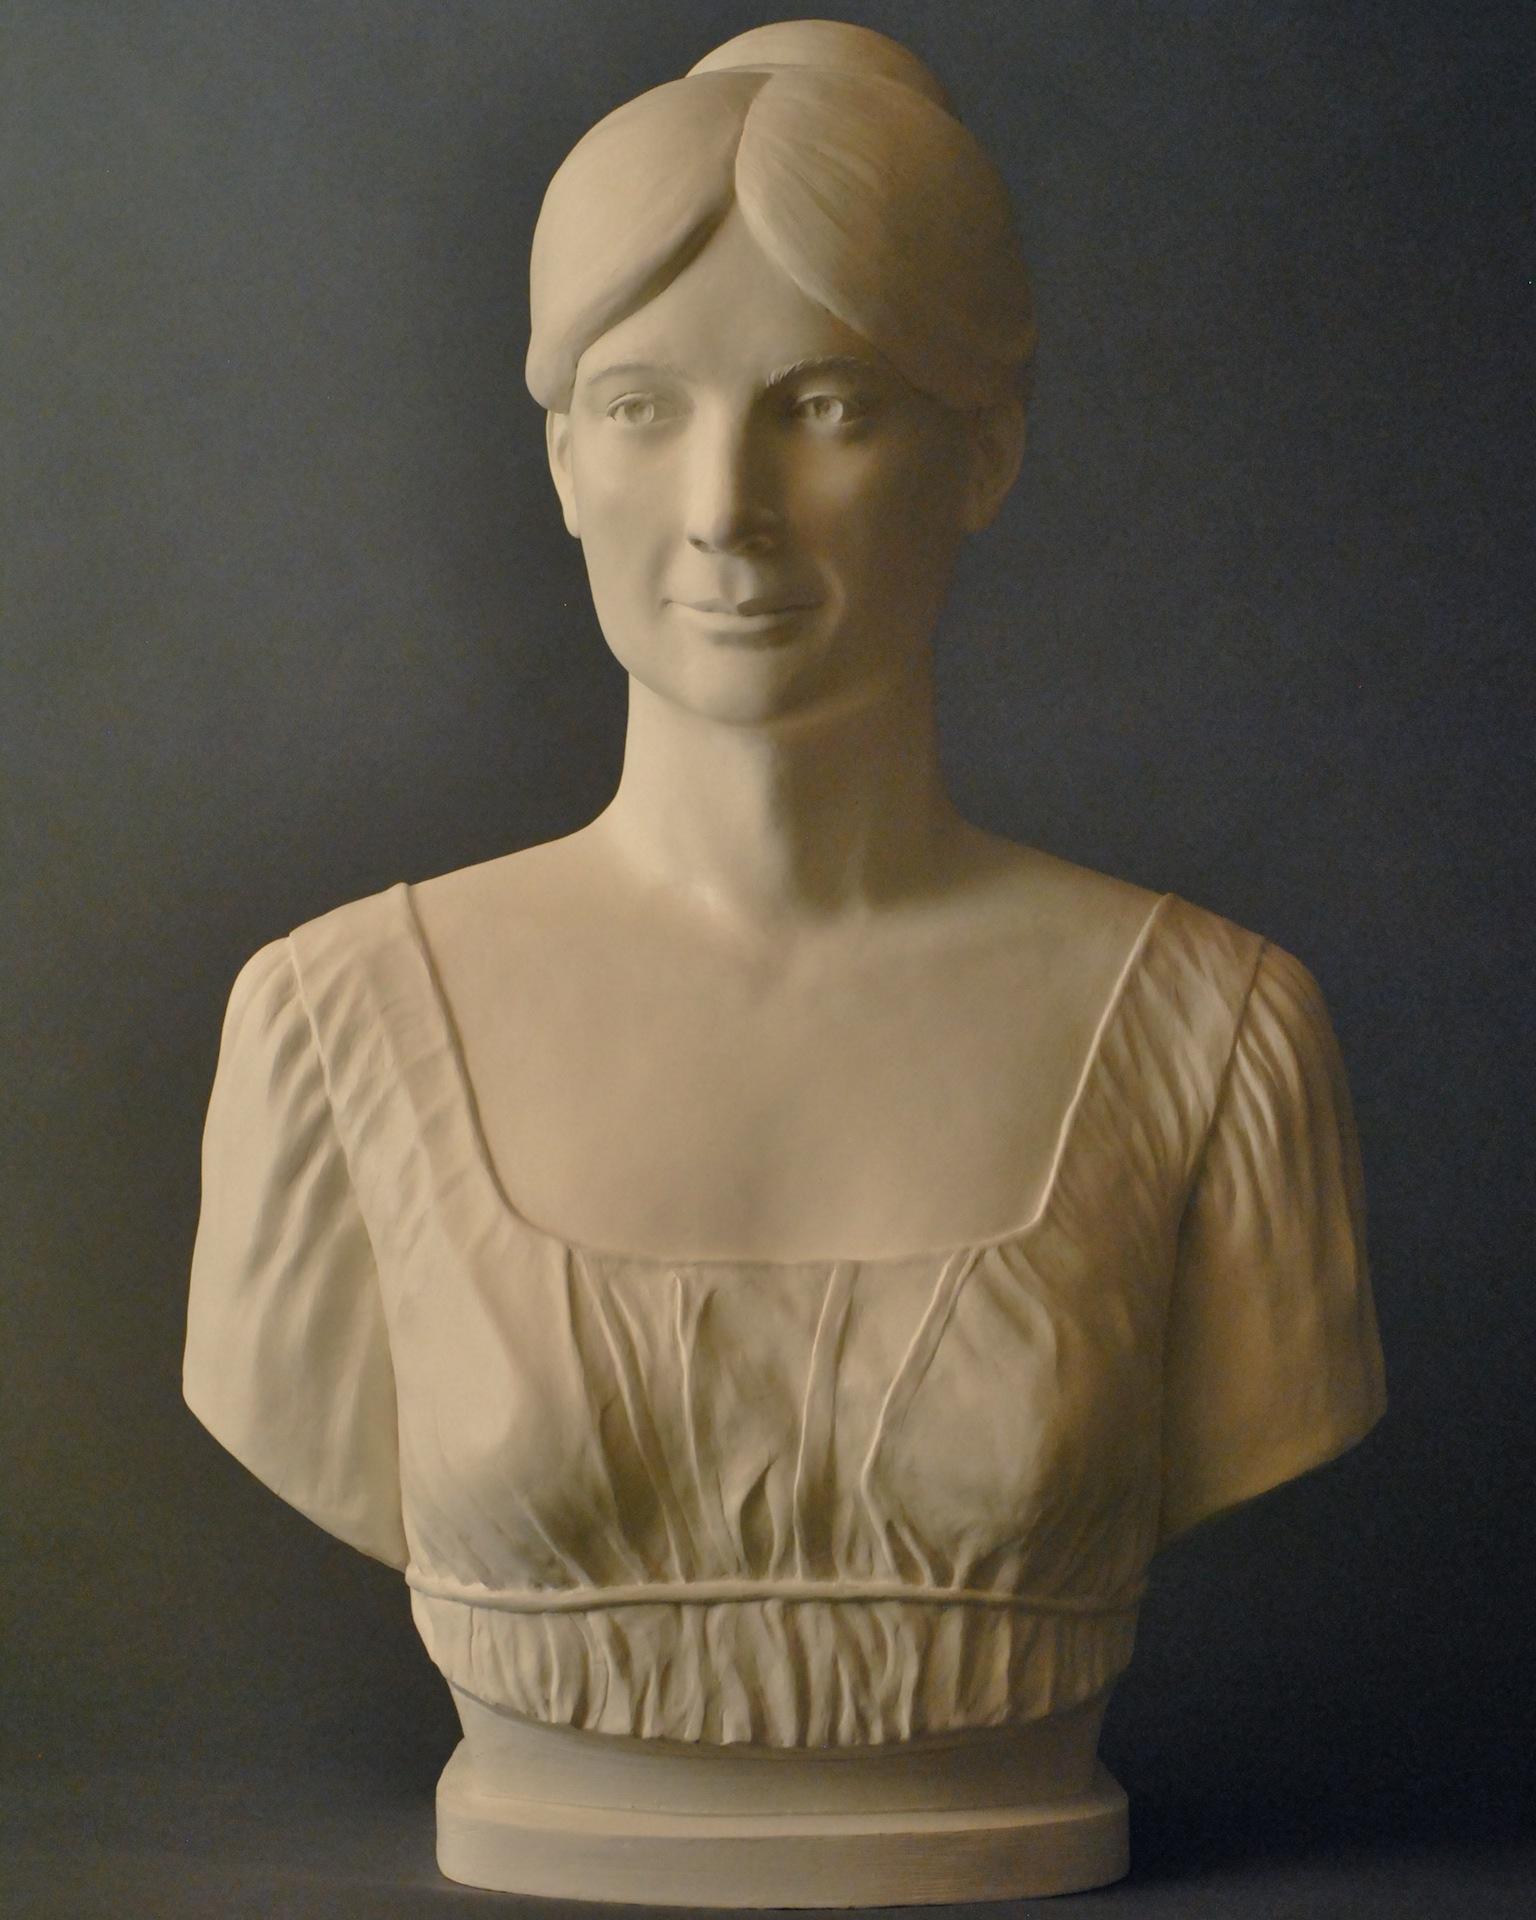 Frances T. 8x10 1920.jpg